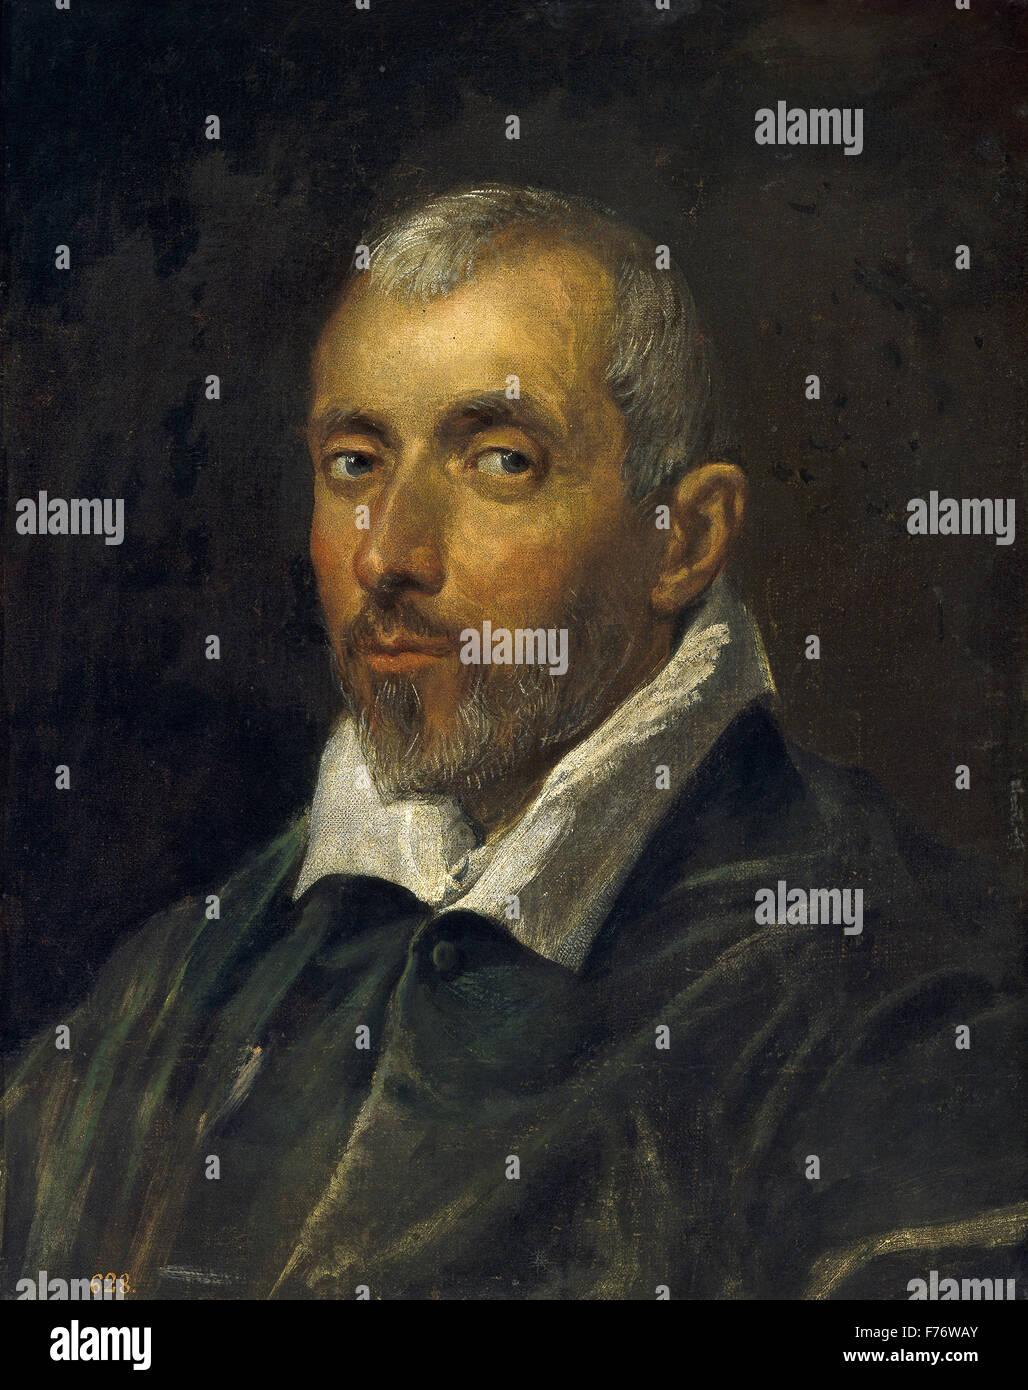 Jacopo Tintoretto - Venetian Magistrate - Stock Image